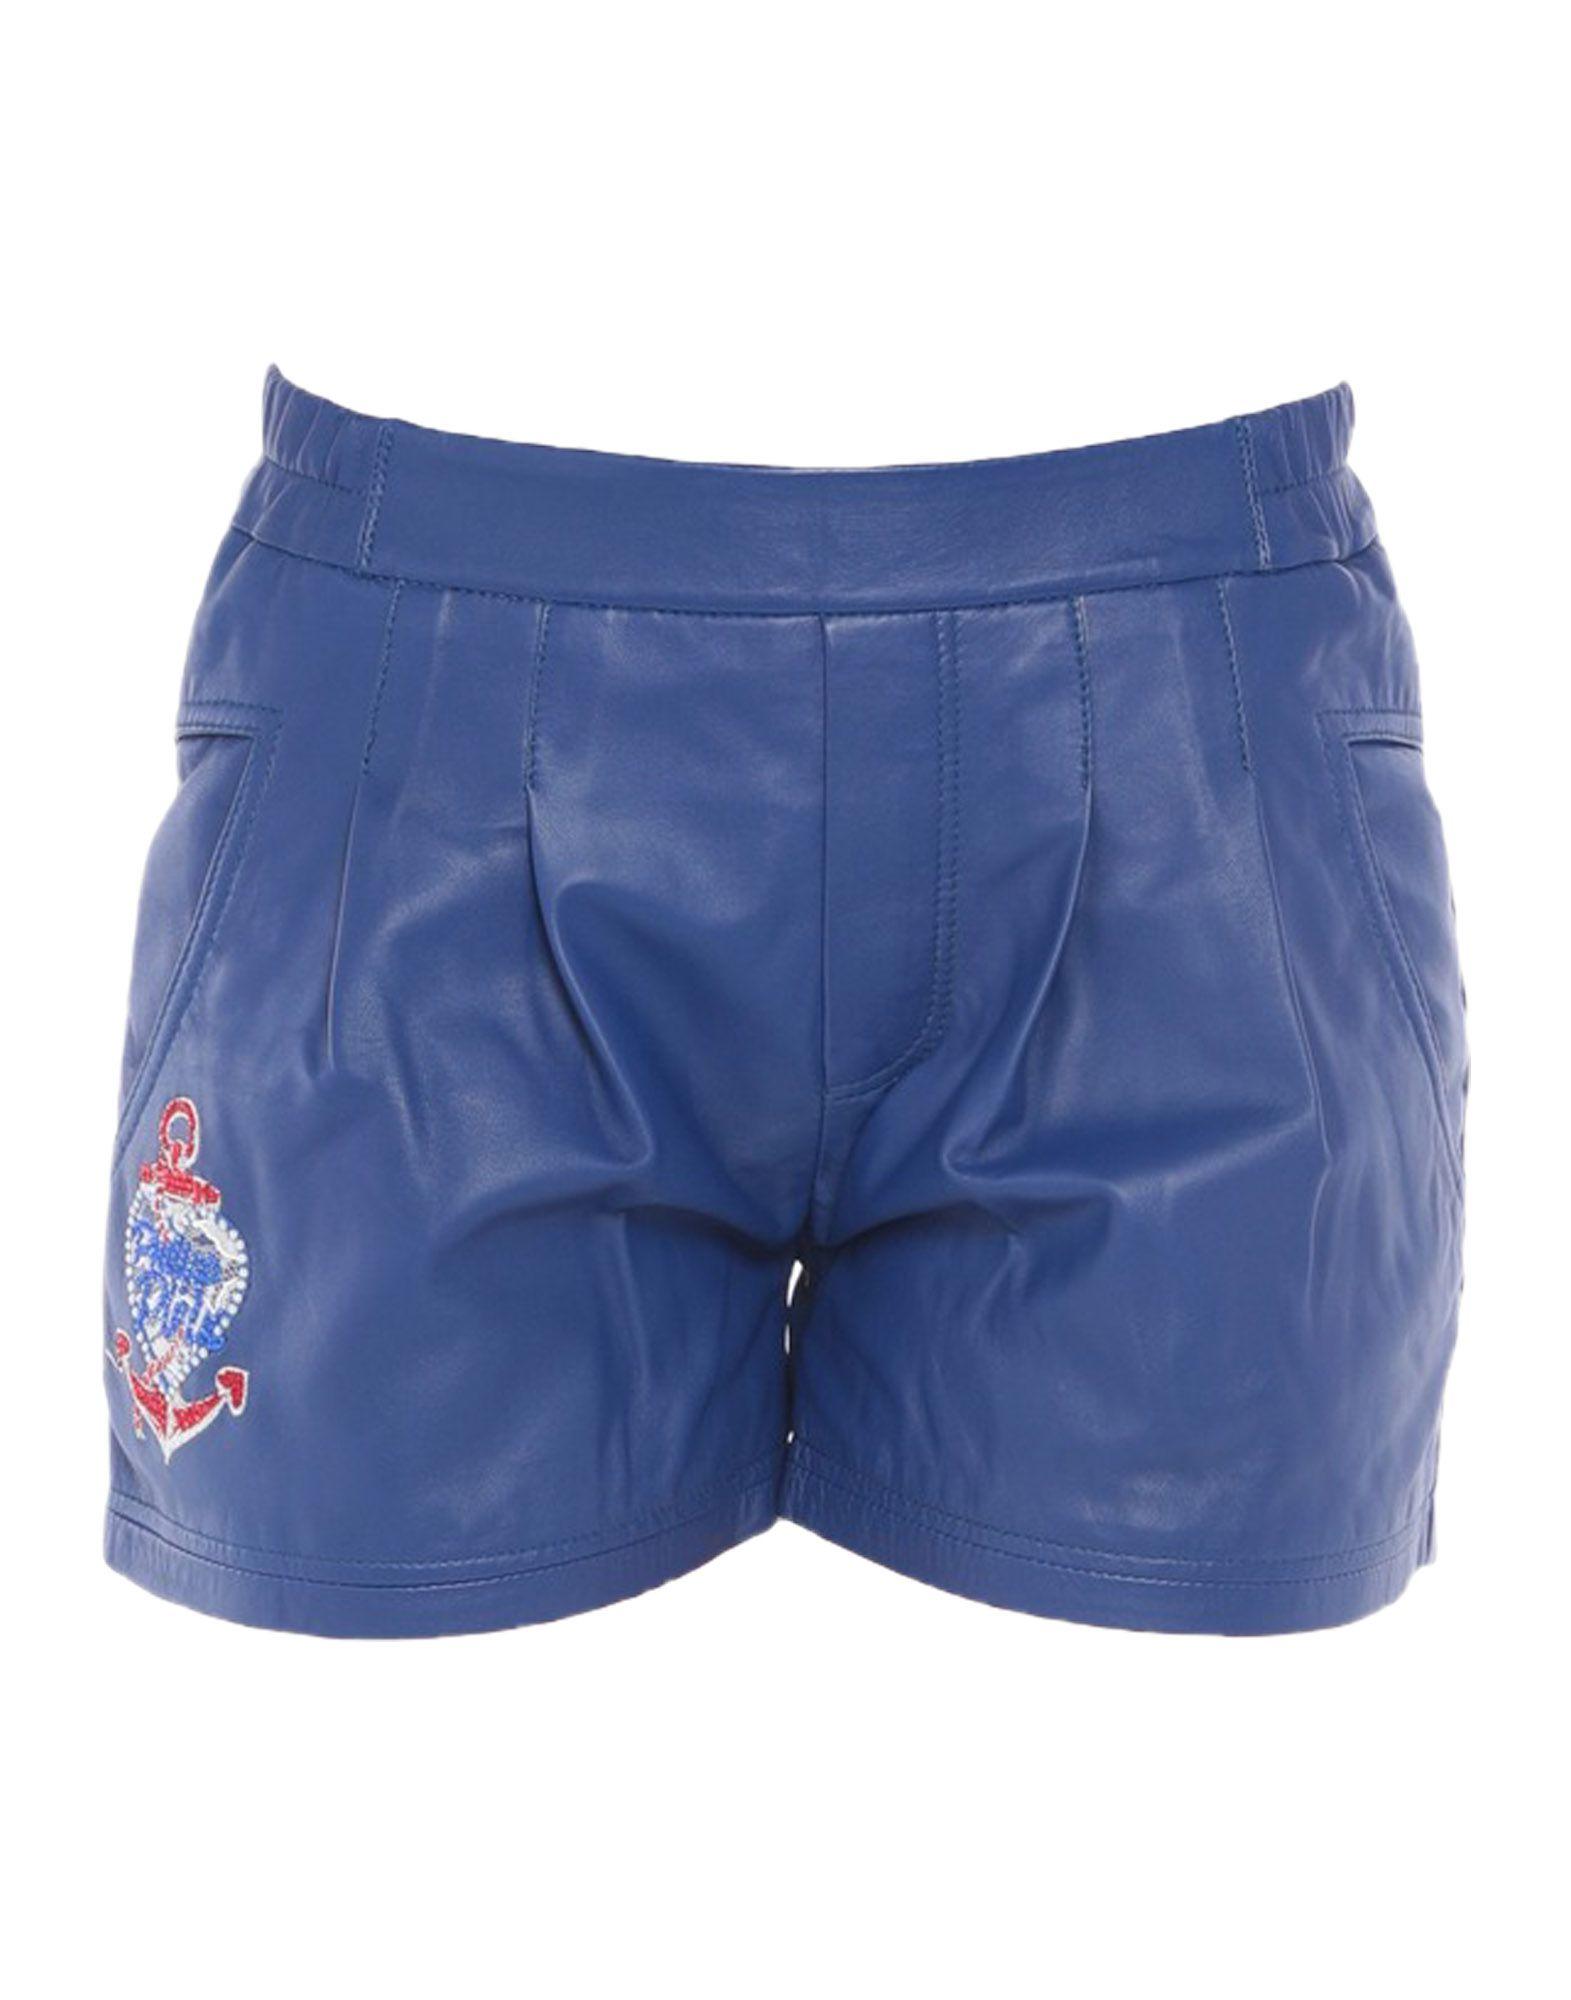 Shorts & Bermuda Philipp Plein donna donna donna - 13268316WH a64